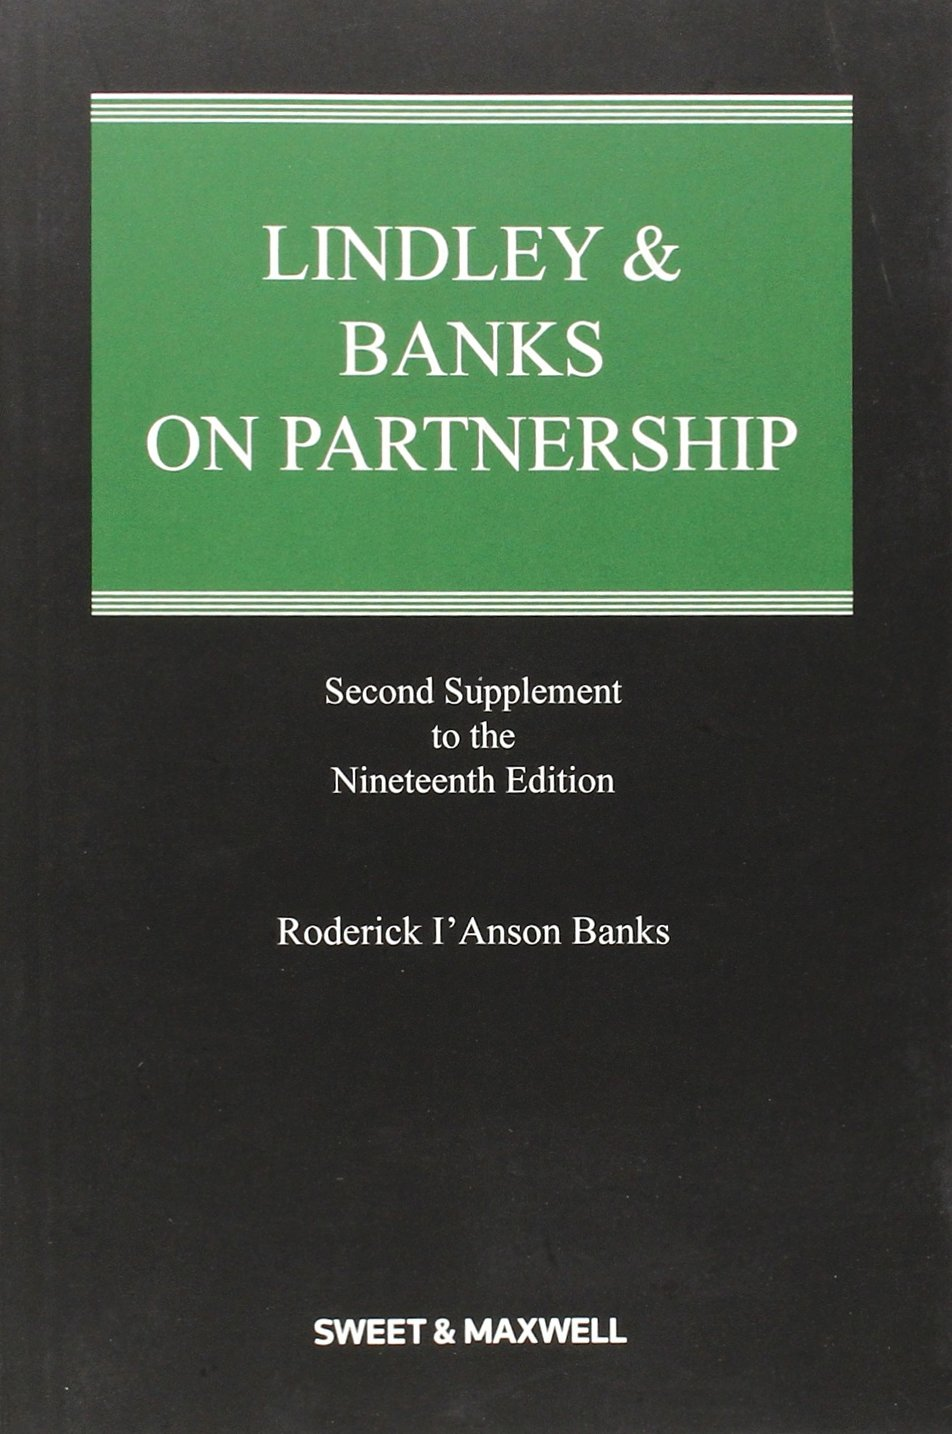 Lindley & Banks on Partnership 2nd Supplement pdf